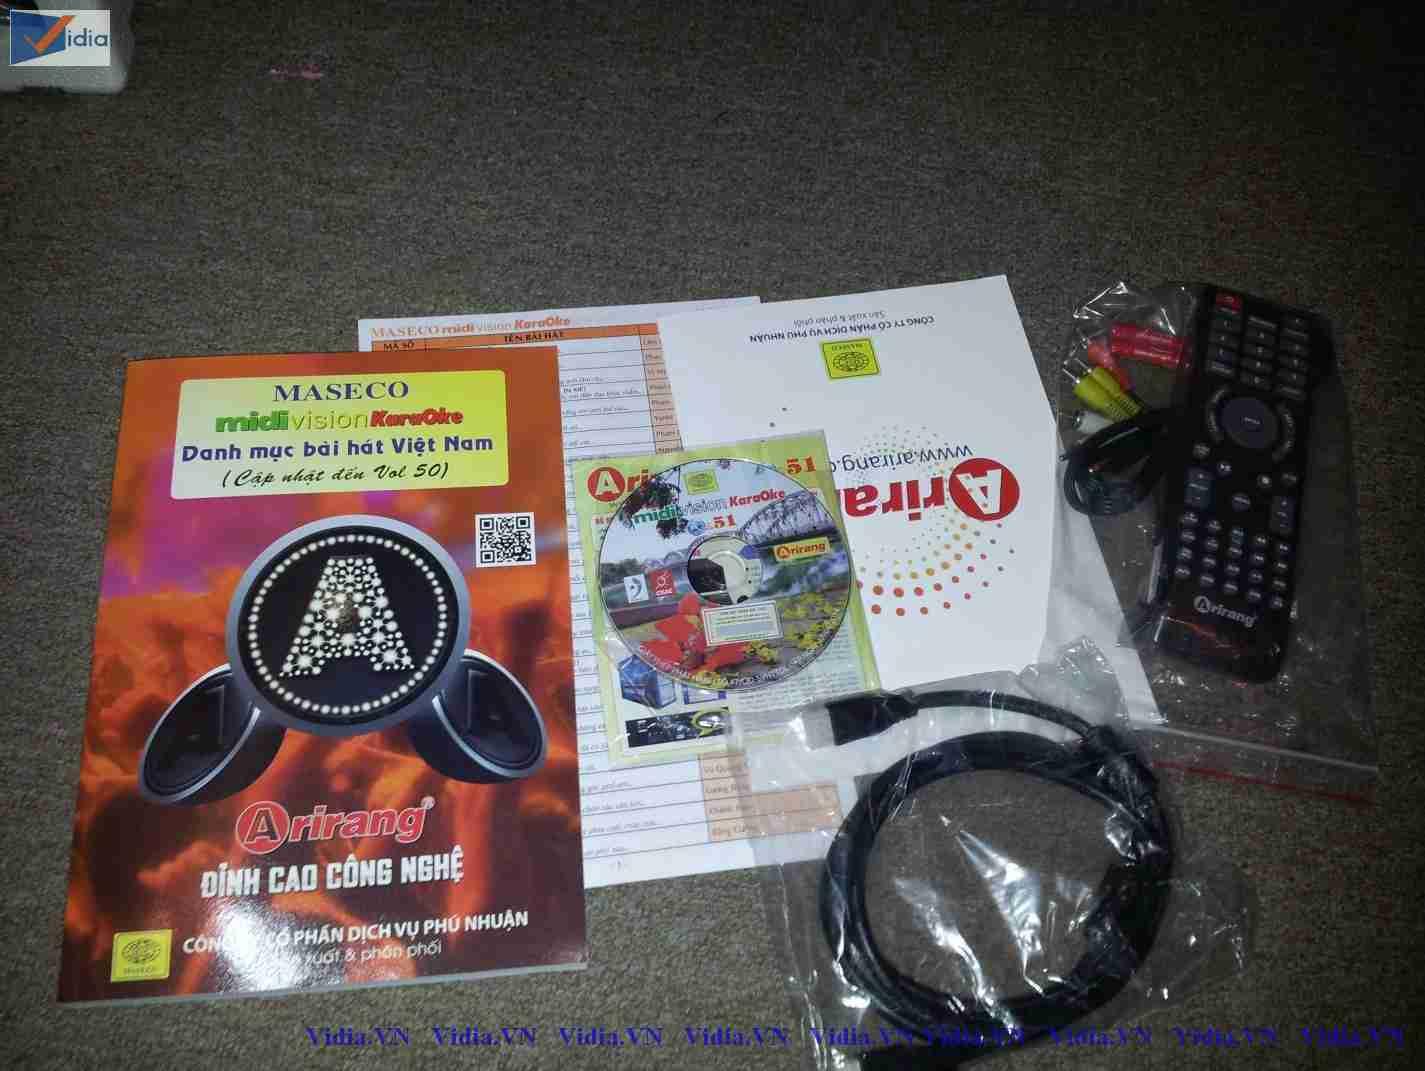 Đầu Karaoke Arirang AR-3600KTV